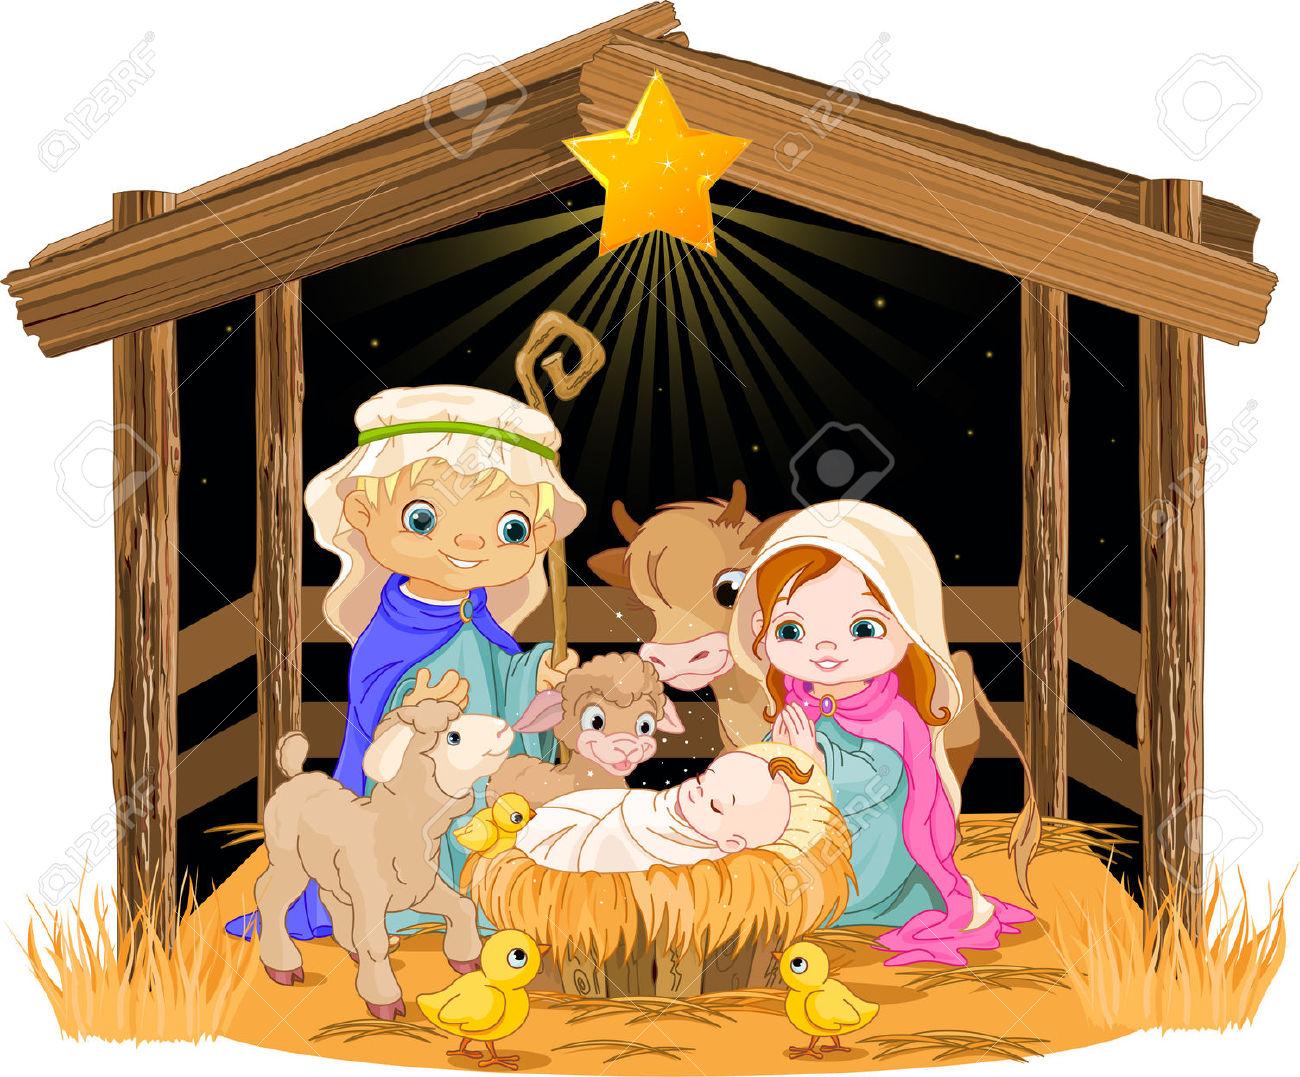 3,312 Nativity Scene Stock Vector Illustration And Royalty Free.